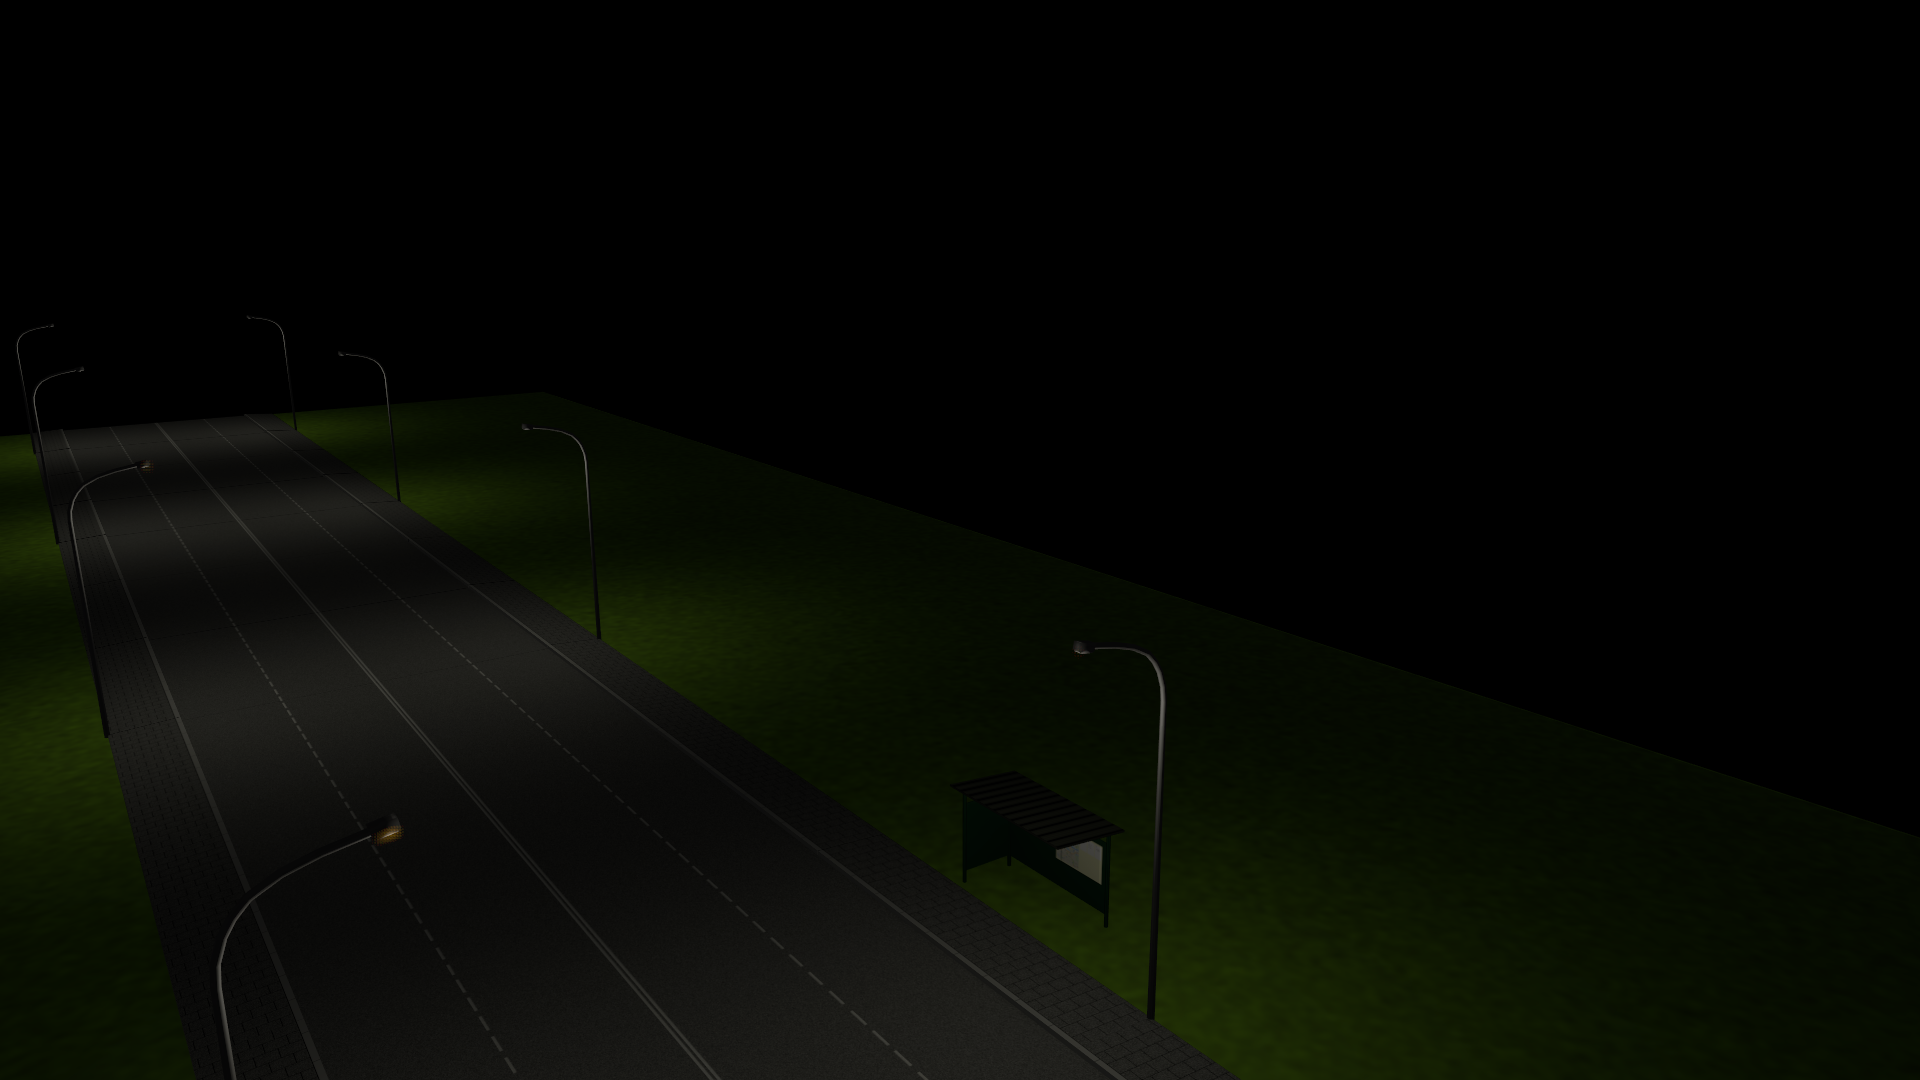 Glow map on street lights